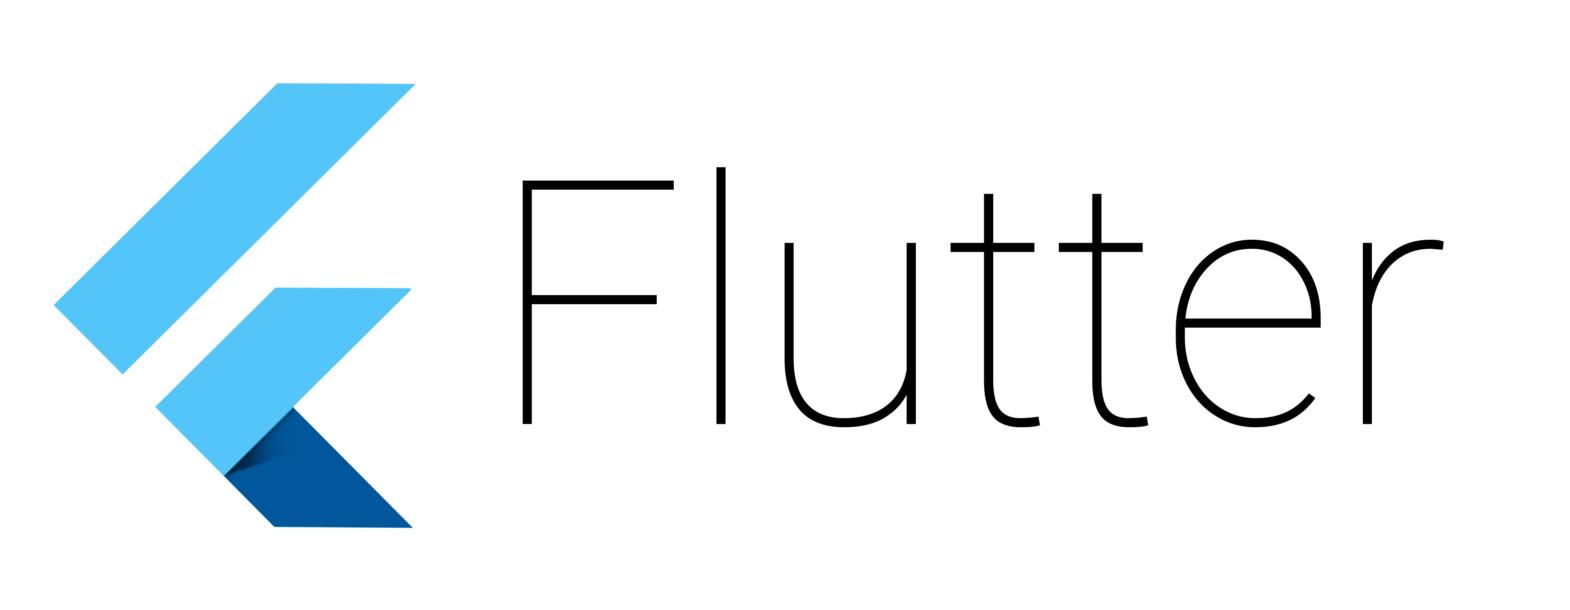 Google starts a push for cross-platform app development with Flutter